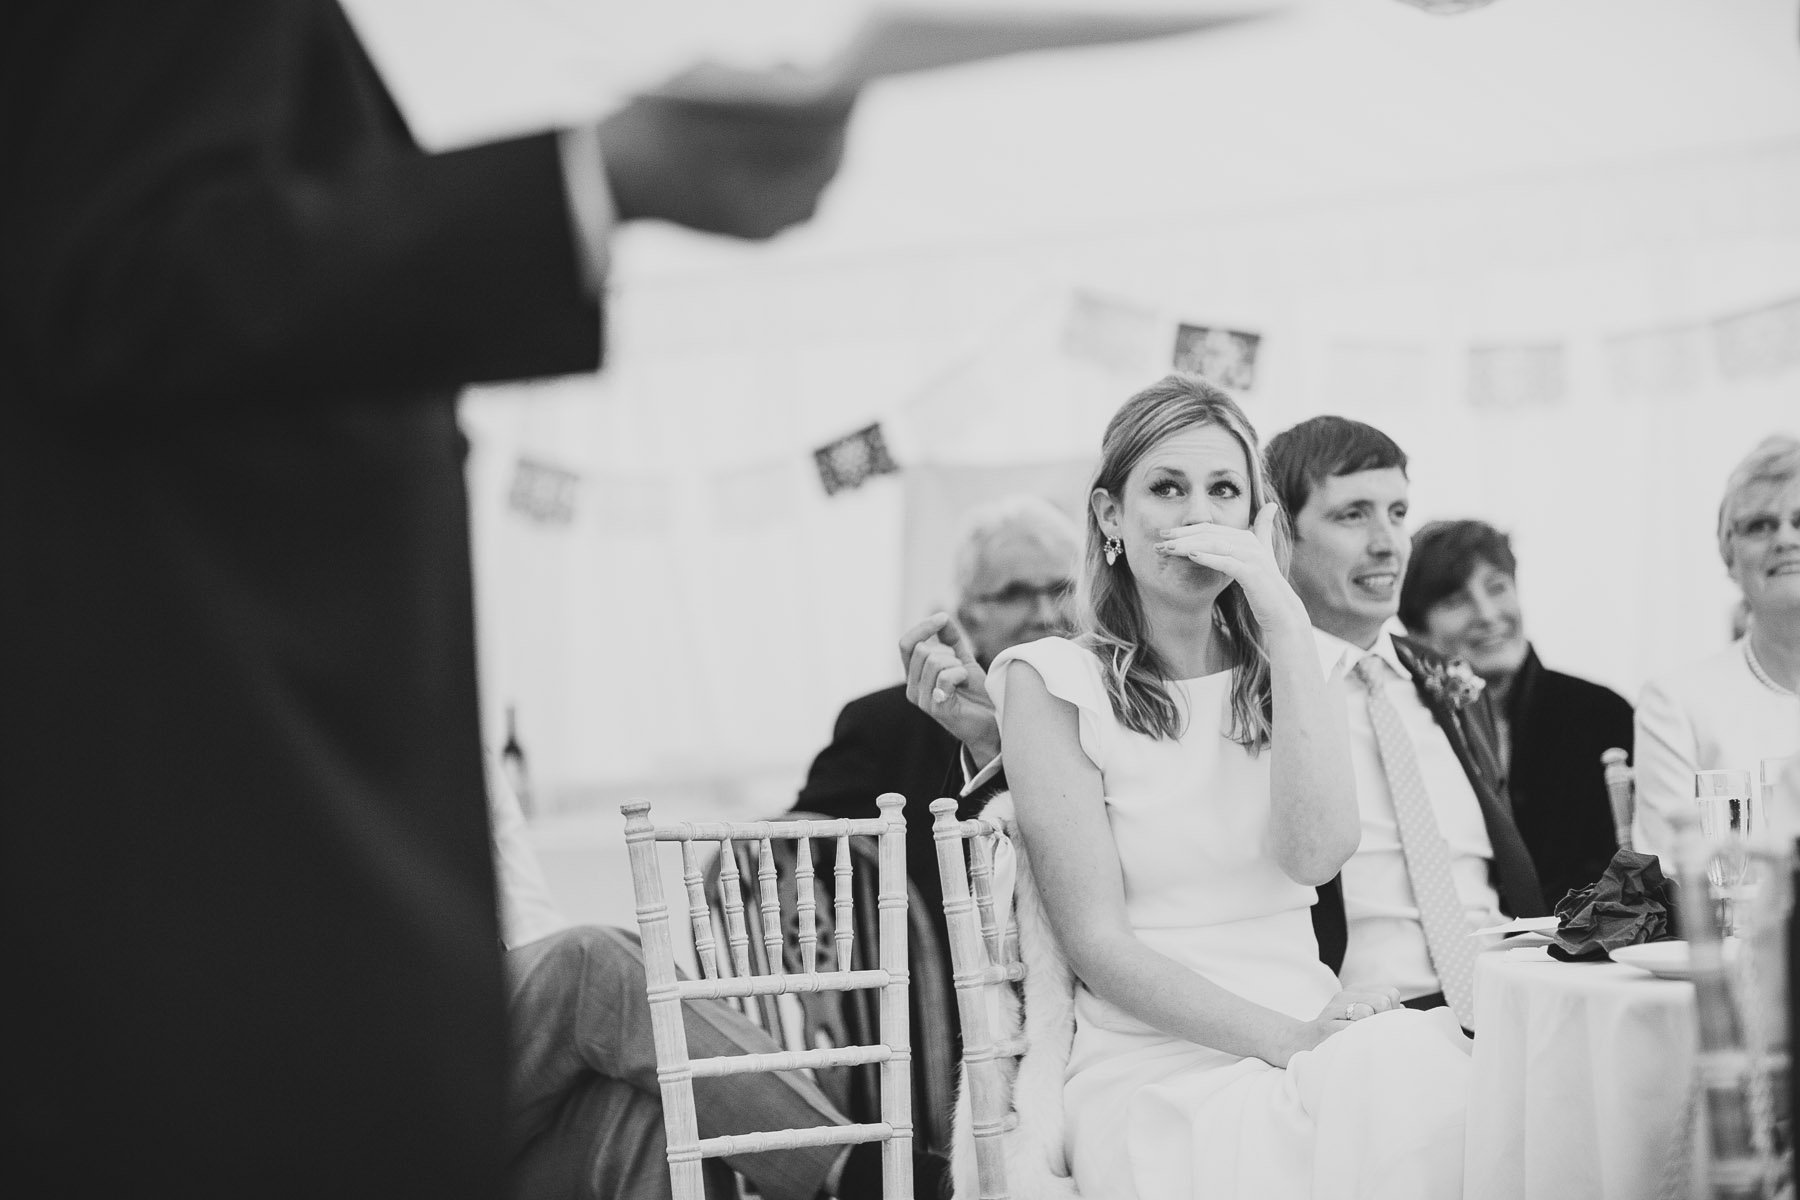 Buckinghamshire-Wedding-Lizzie-Duncan-134